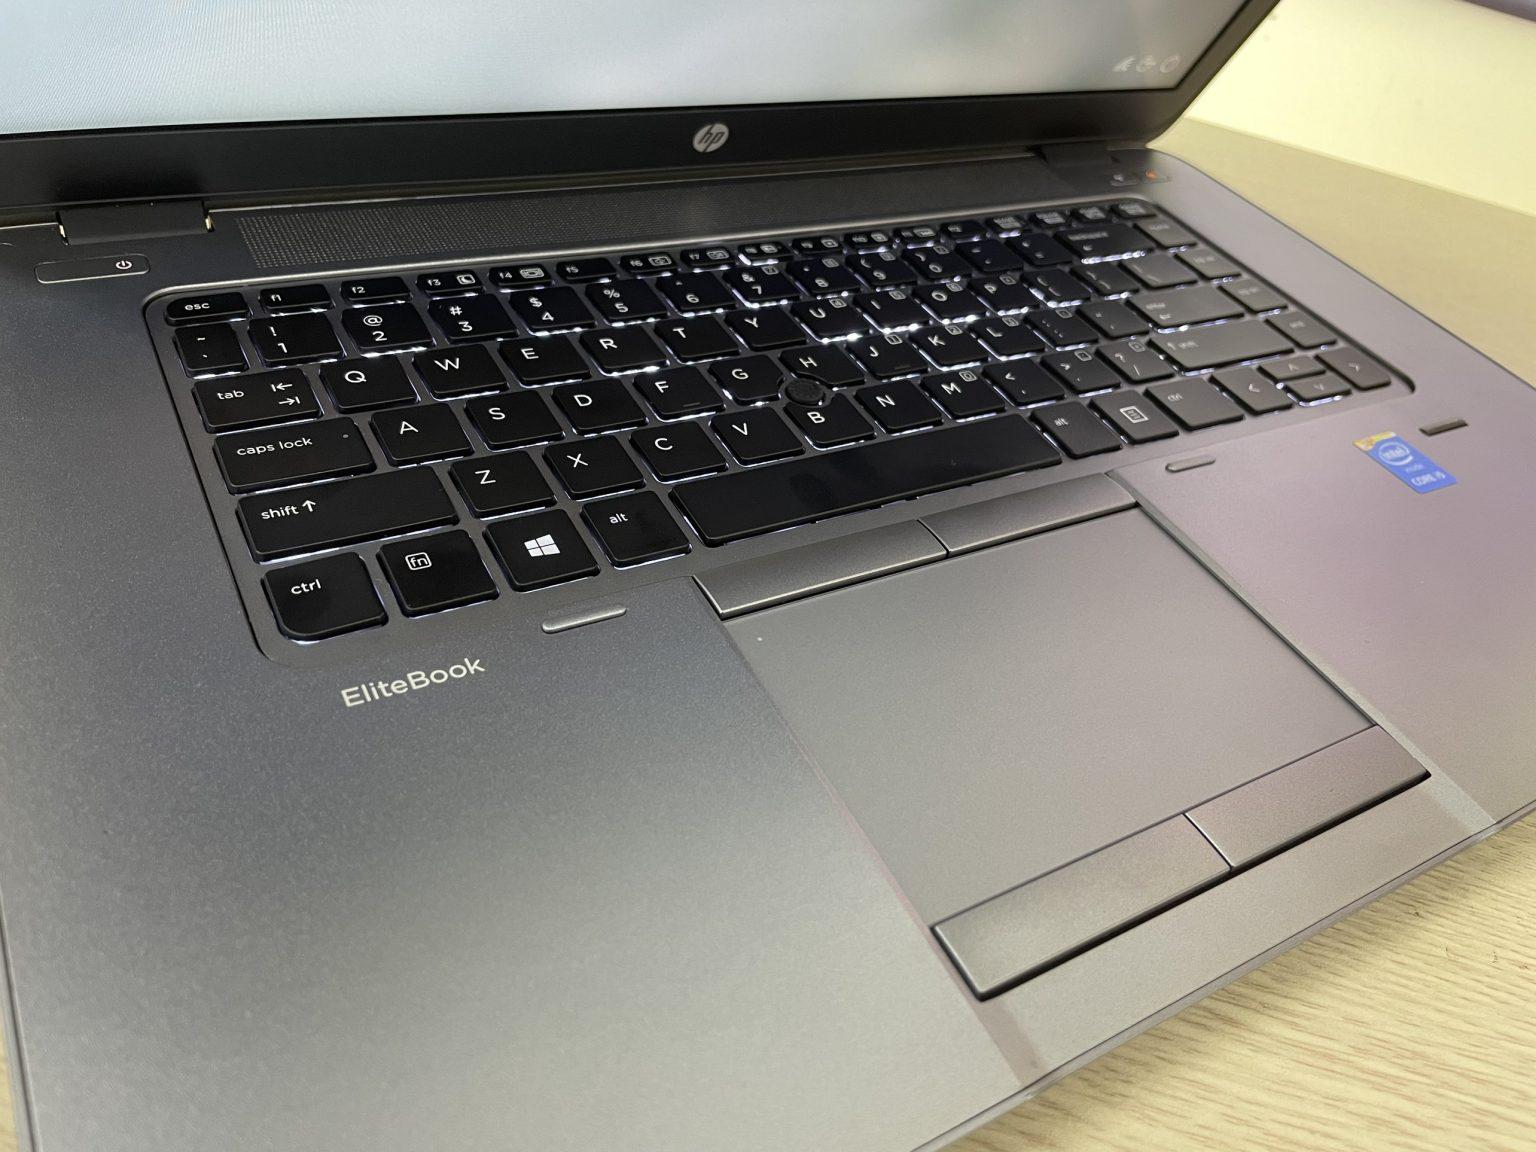 LAPTOP HP ELITEBOOK 850 G2 i5